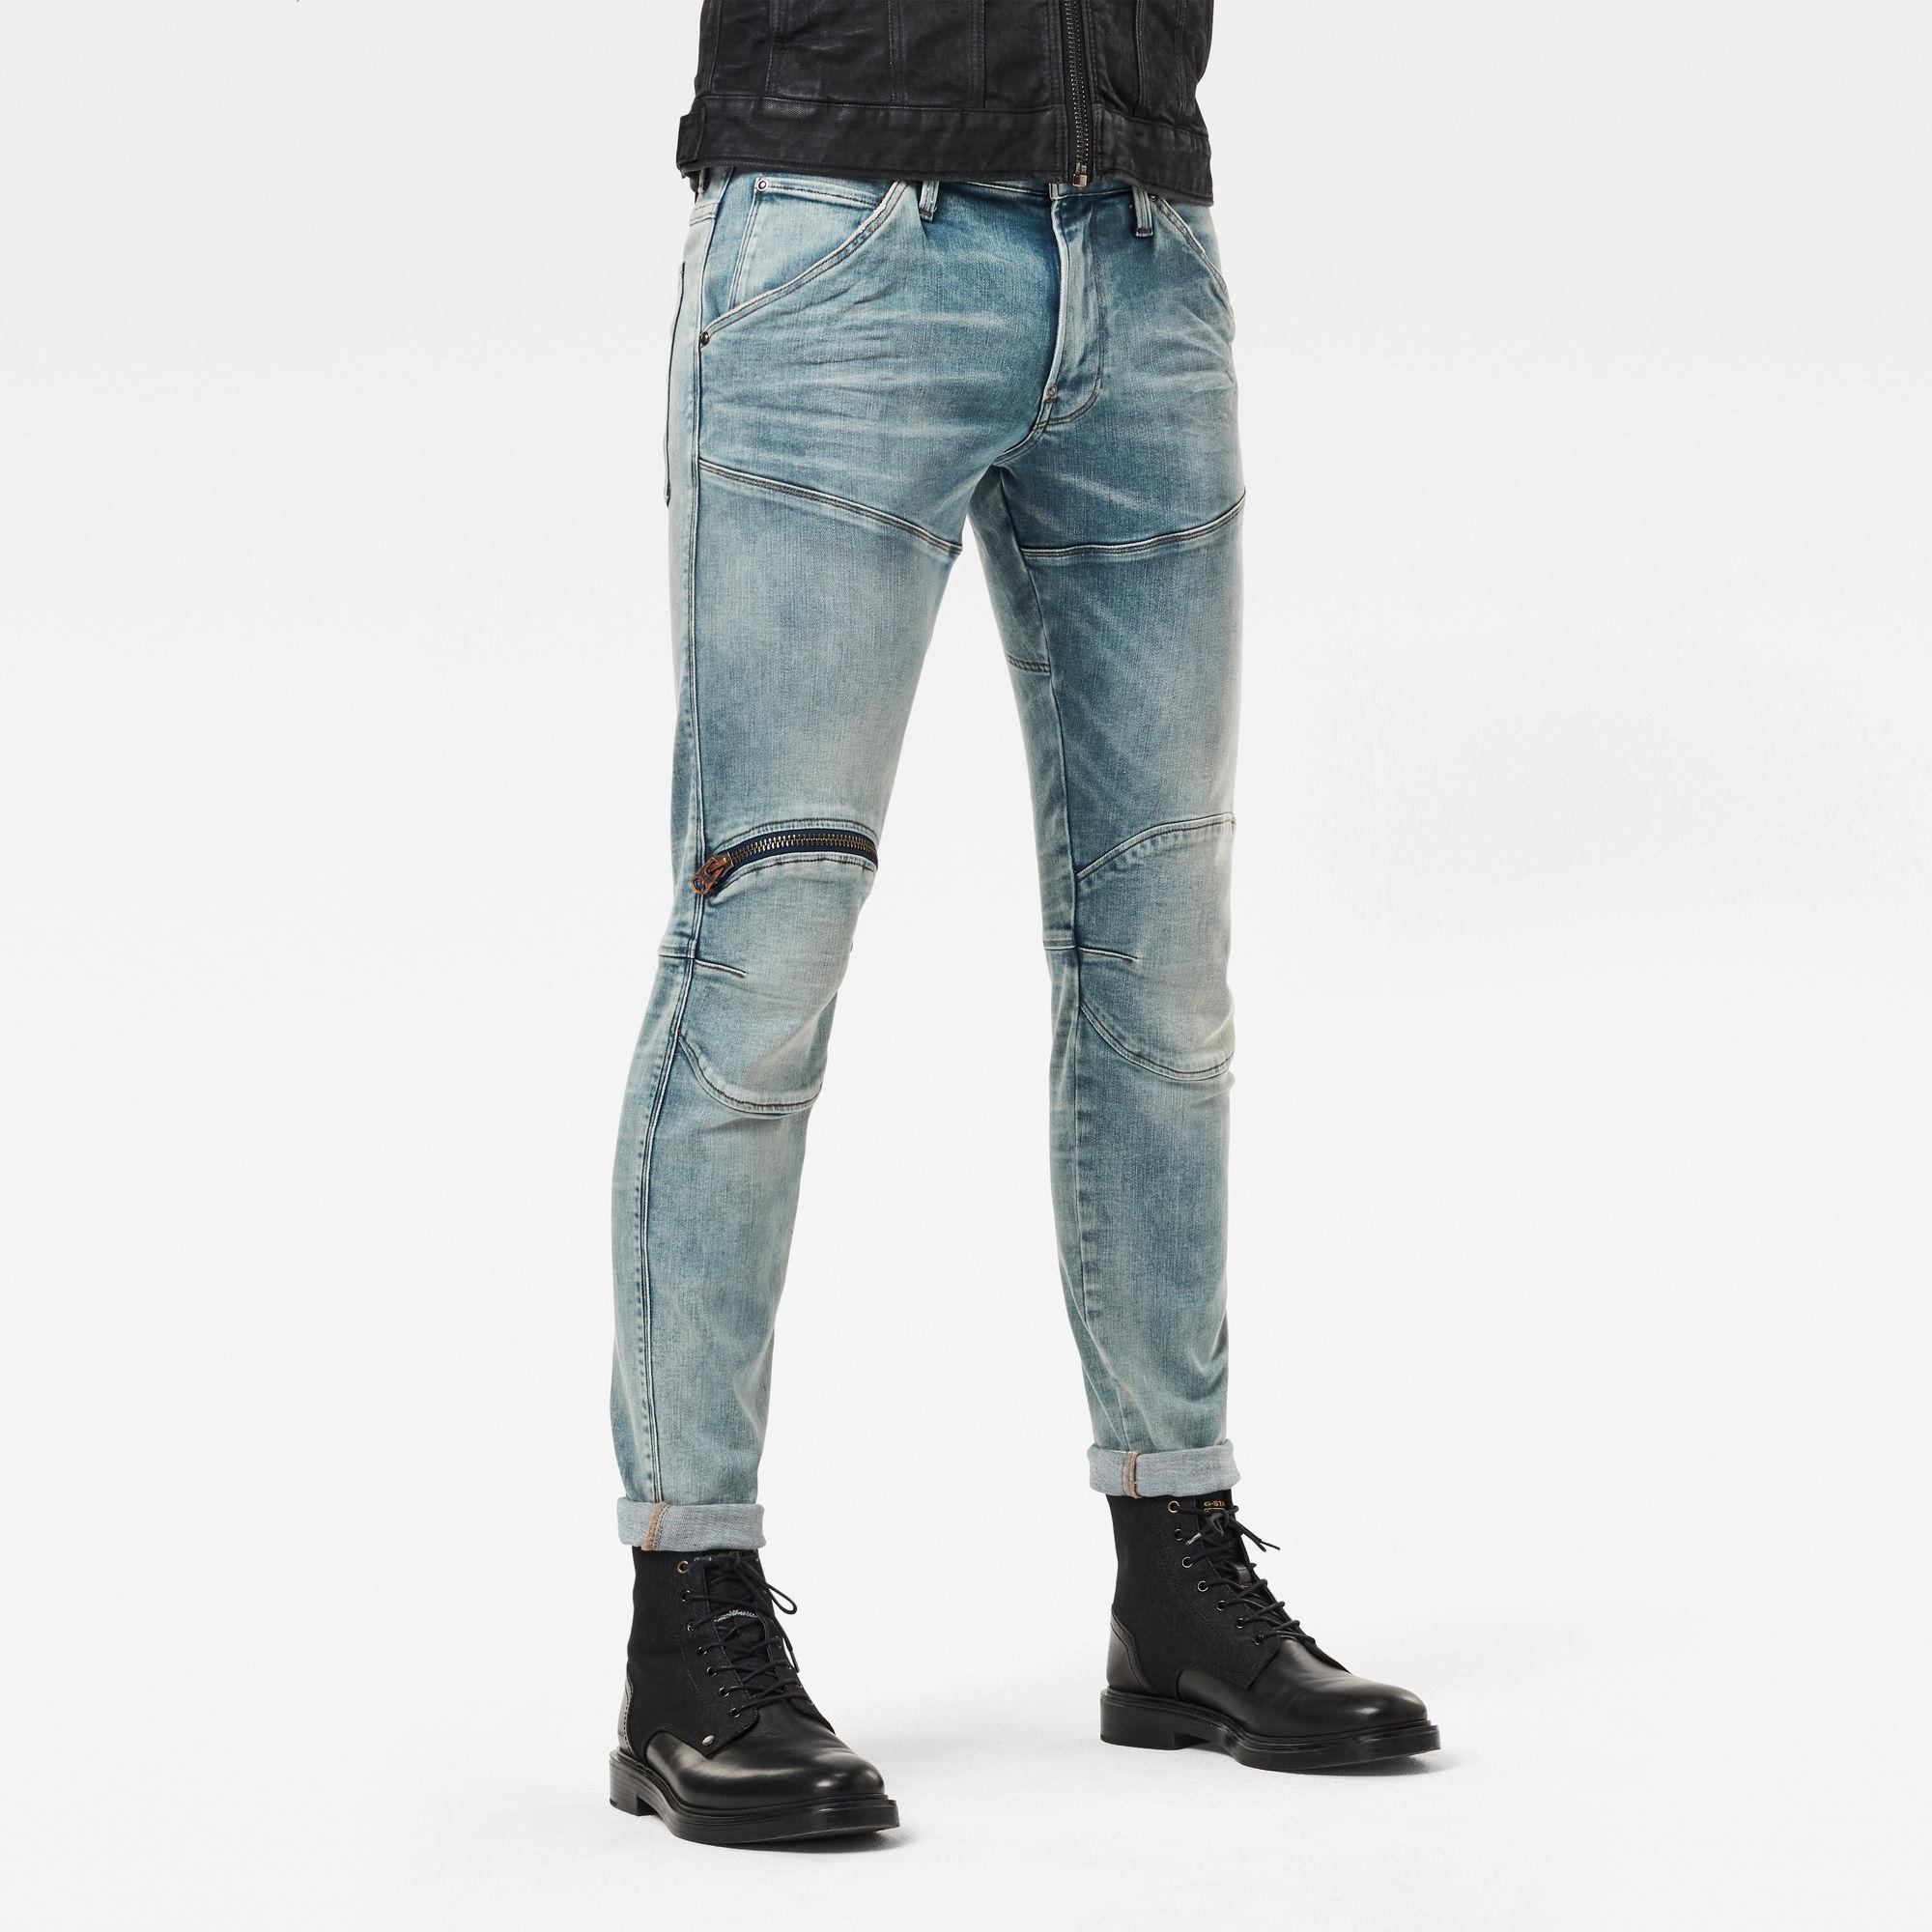 G-Star RAW Heren 5620 3D Zip Knee Skinny Jeans Lichtblauw